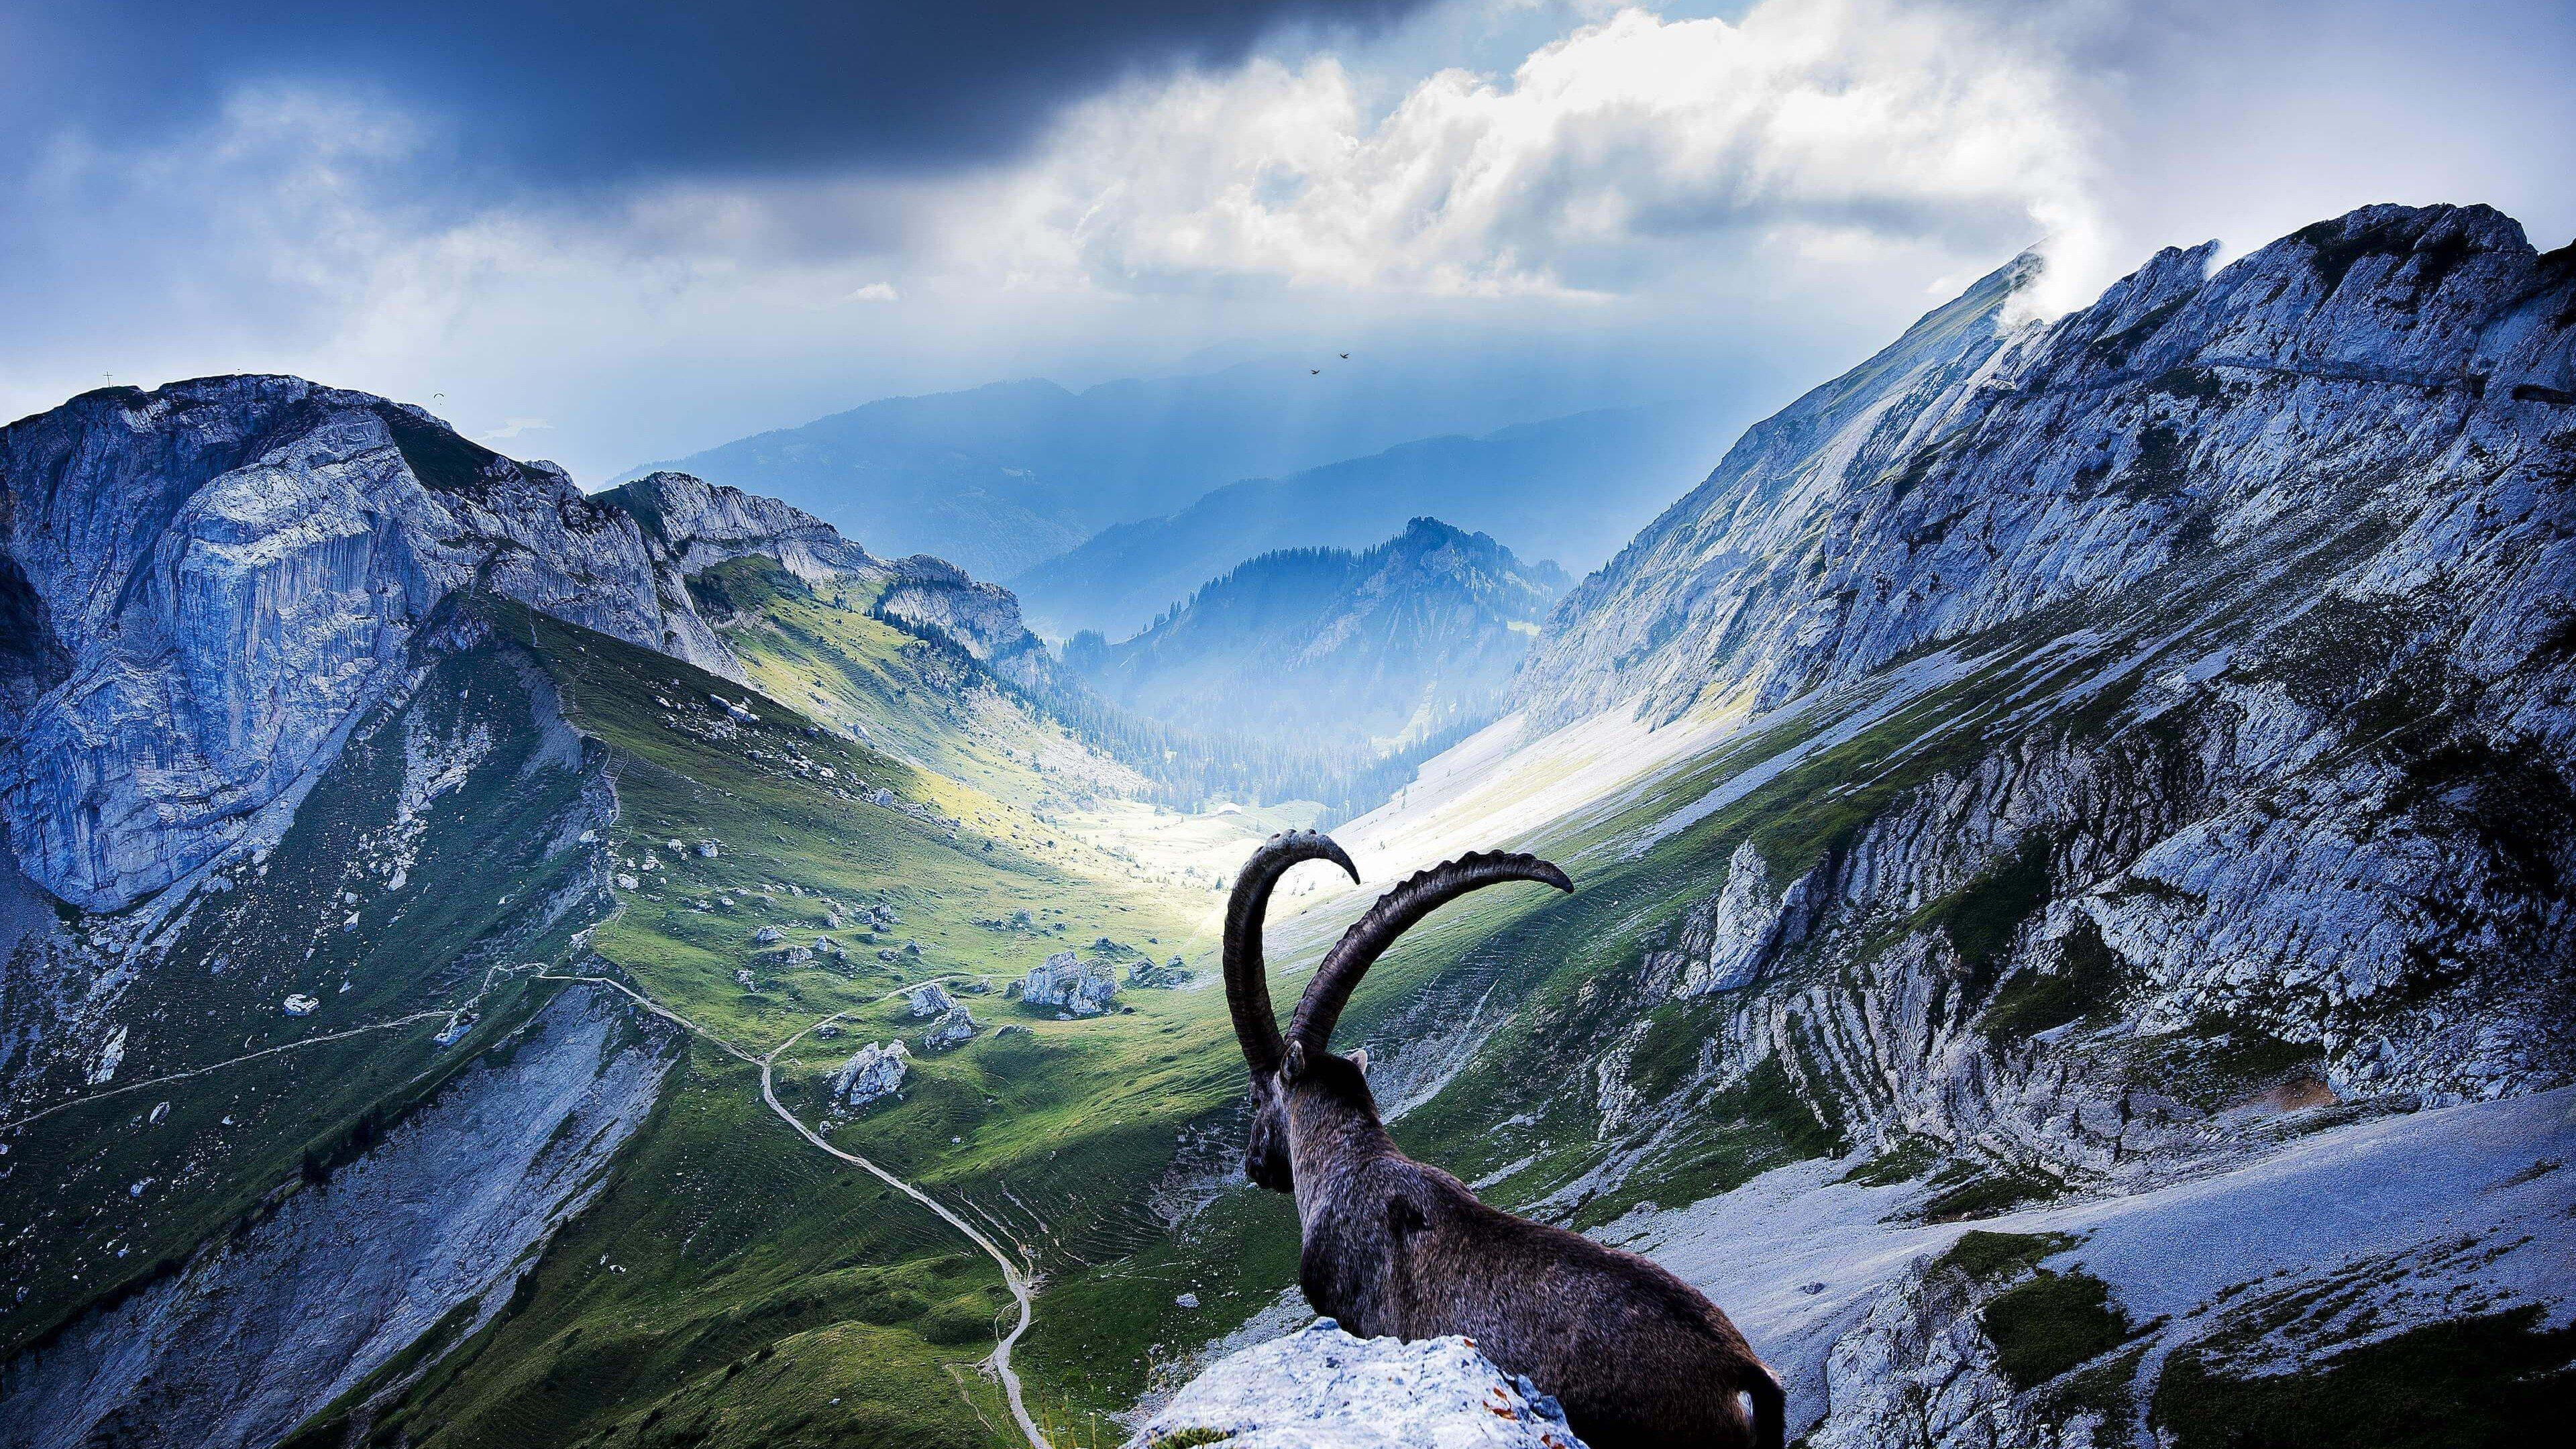 Switzerland HD wallpaper for 4K 3840 x 2160   HDwallpapersnet 3840x2160